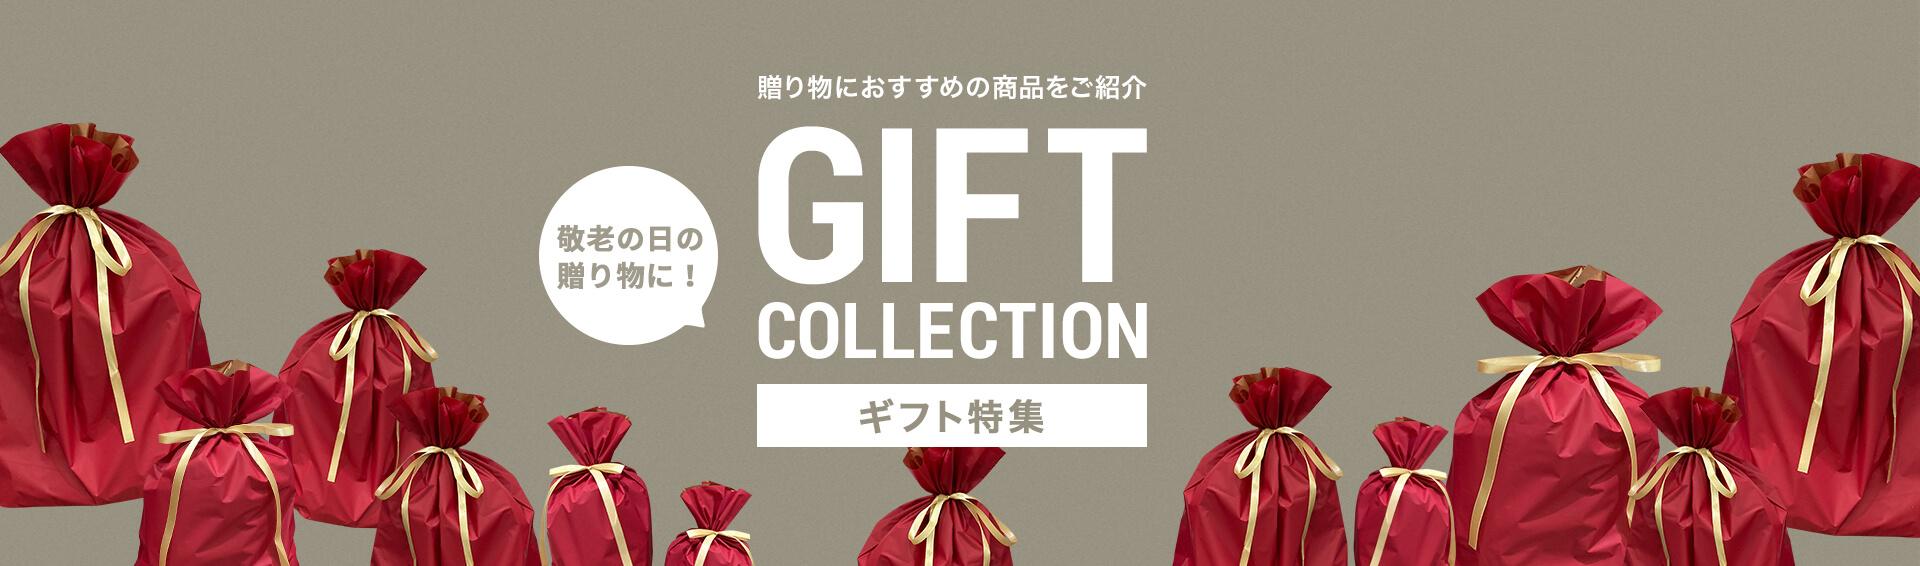 top_gift_keirou_pc.jpg